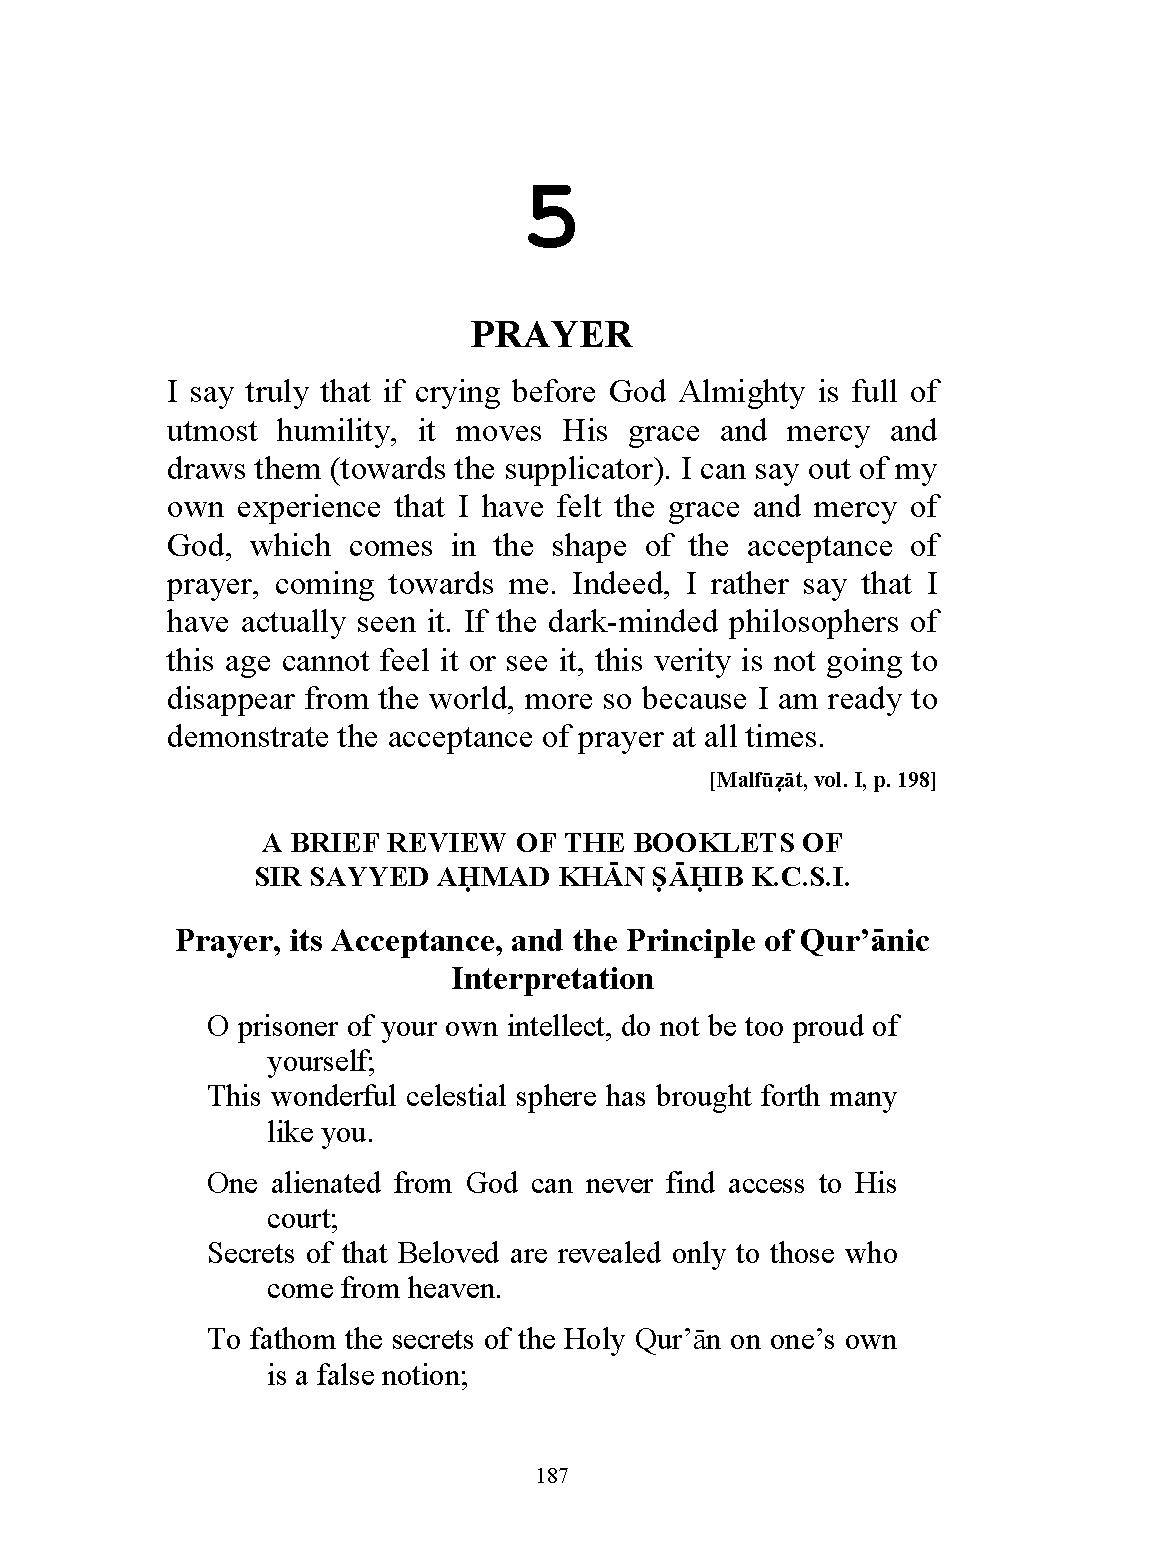 The Essence of Islam - Volume 2: 187